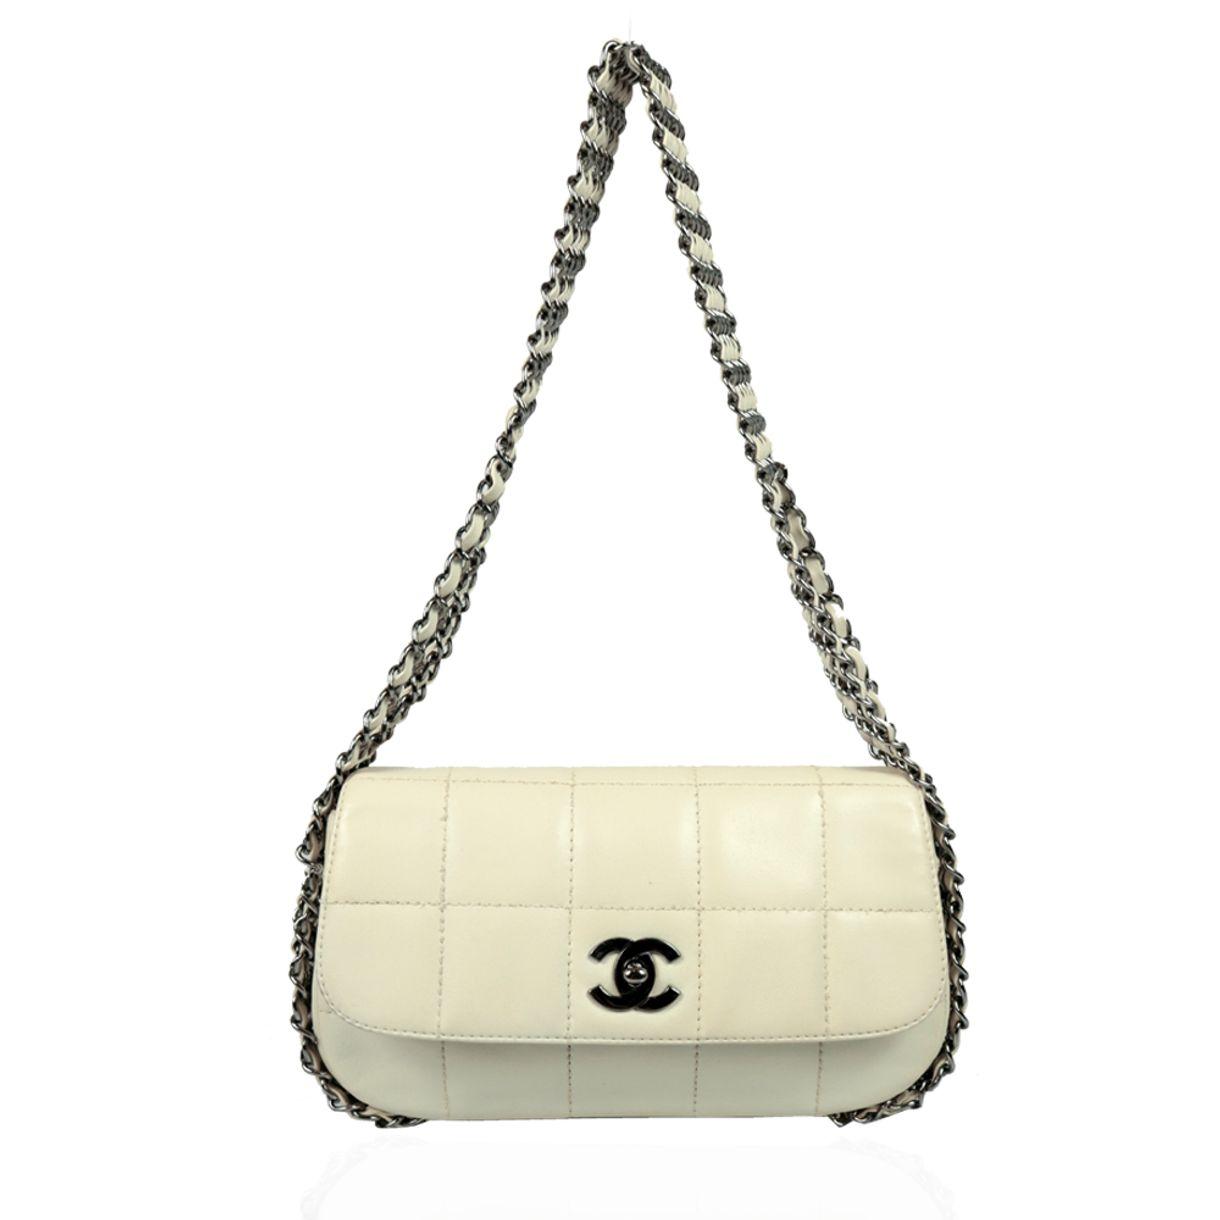 Bolsa-Chanel-Chocolate-Bar-Correntes-Branca